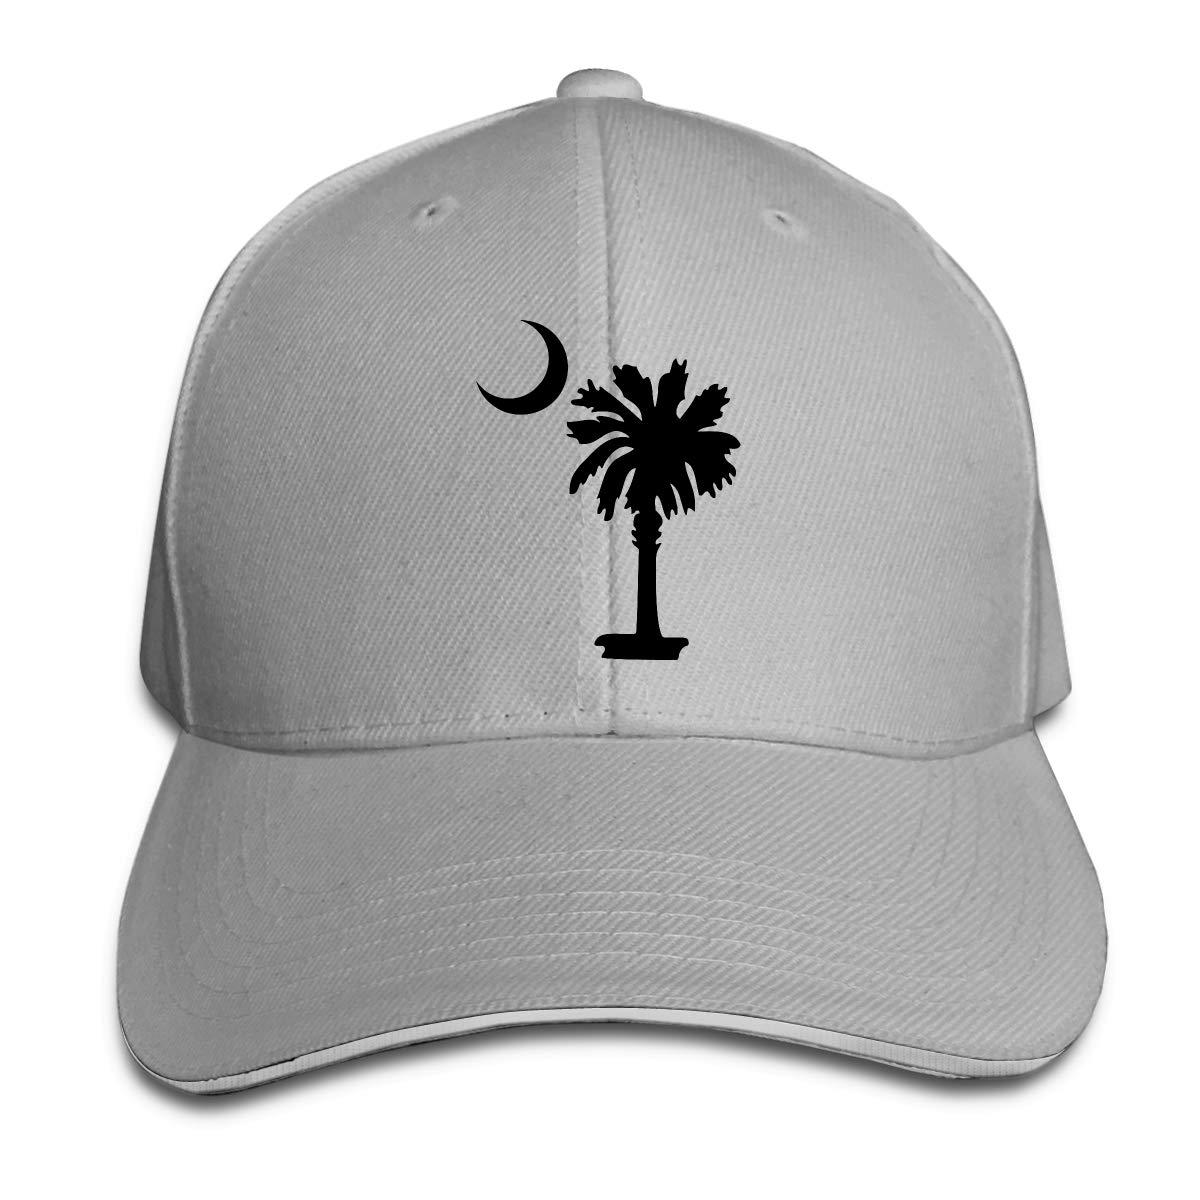 South Carolina State Flag Logo Classic Adjustable Cotton Baseball Caps Trucker Driver Hat Outdoor Cap Gray